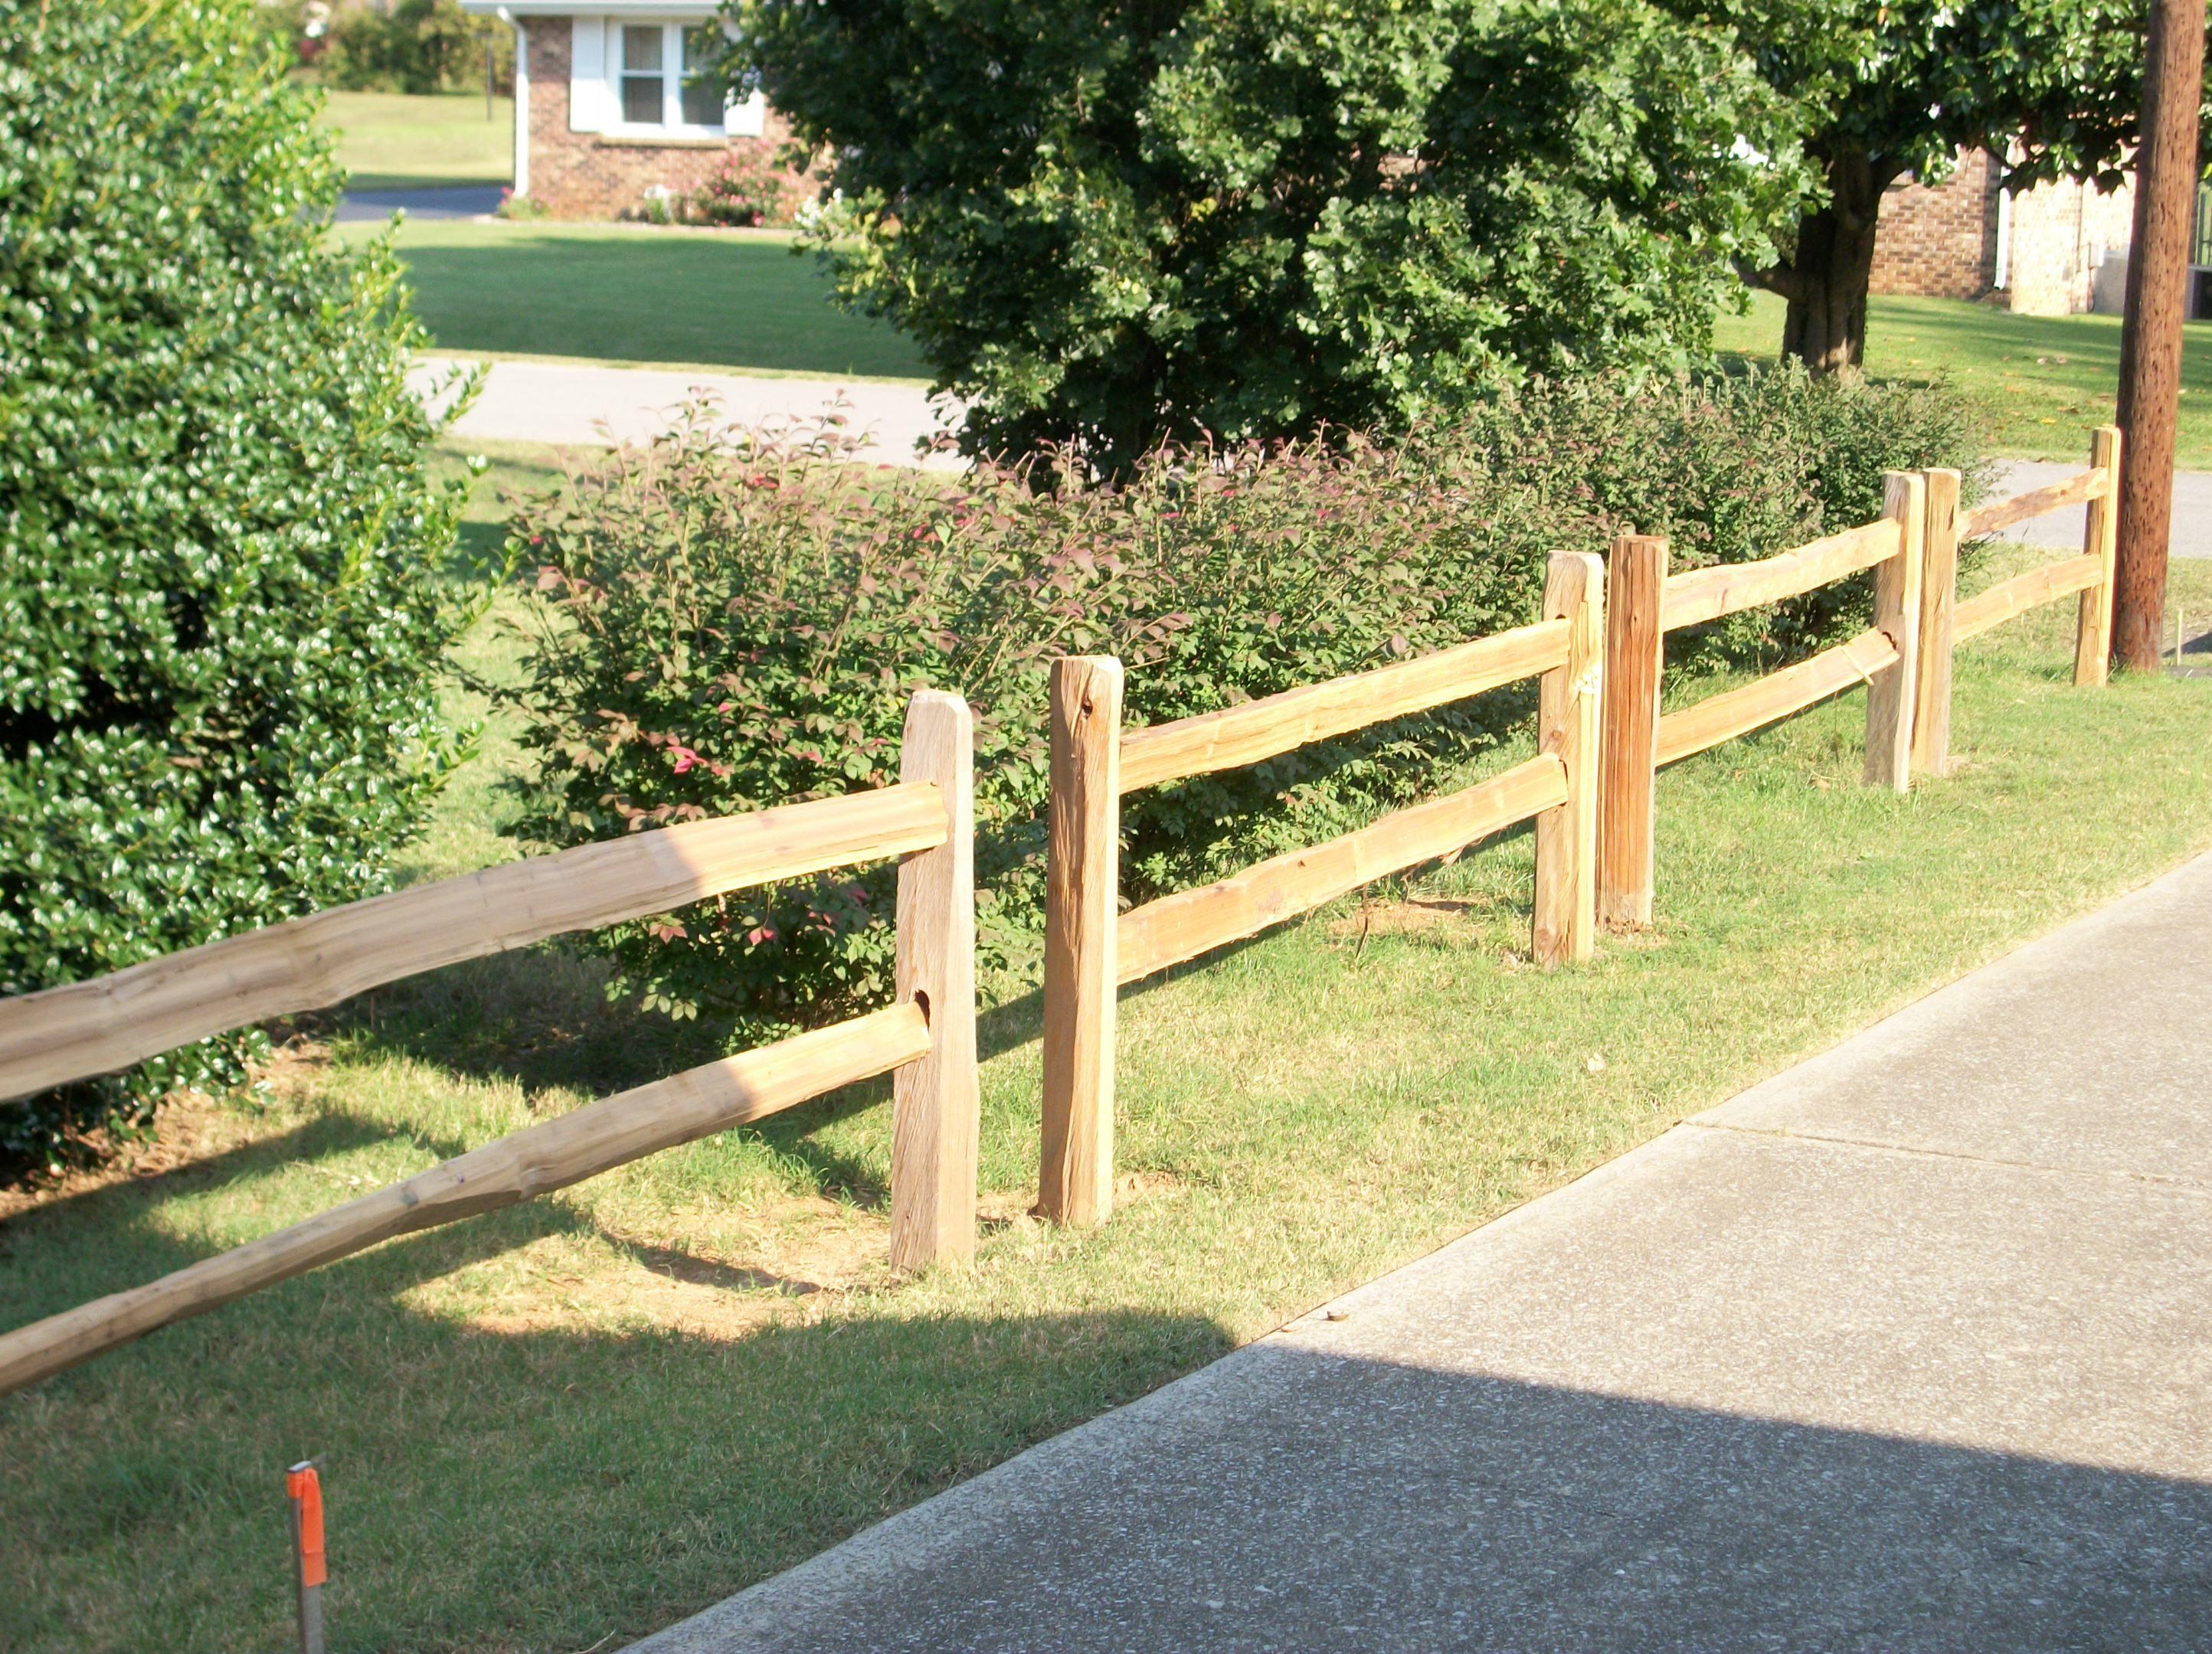 Split Rail Fence Designs Locust split rail fence ohio best fence design 2018 cedar split rail fence 22 vinyl fence ideas for residential homes workwithnaturefo